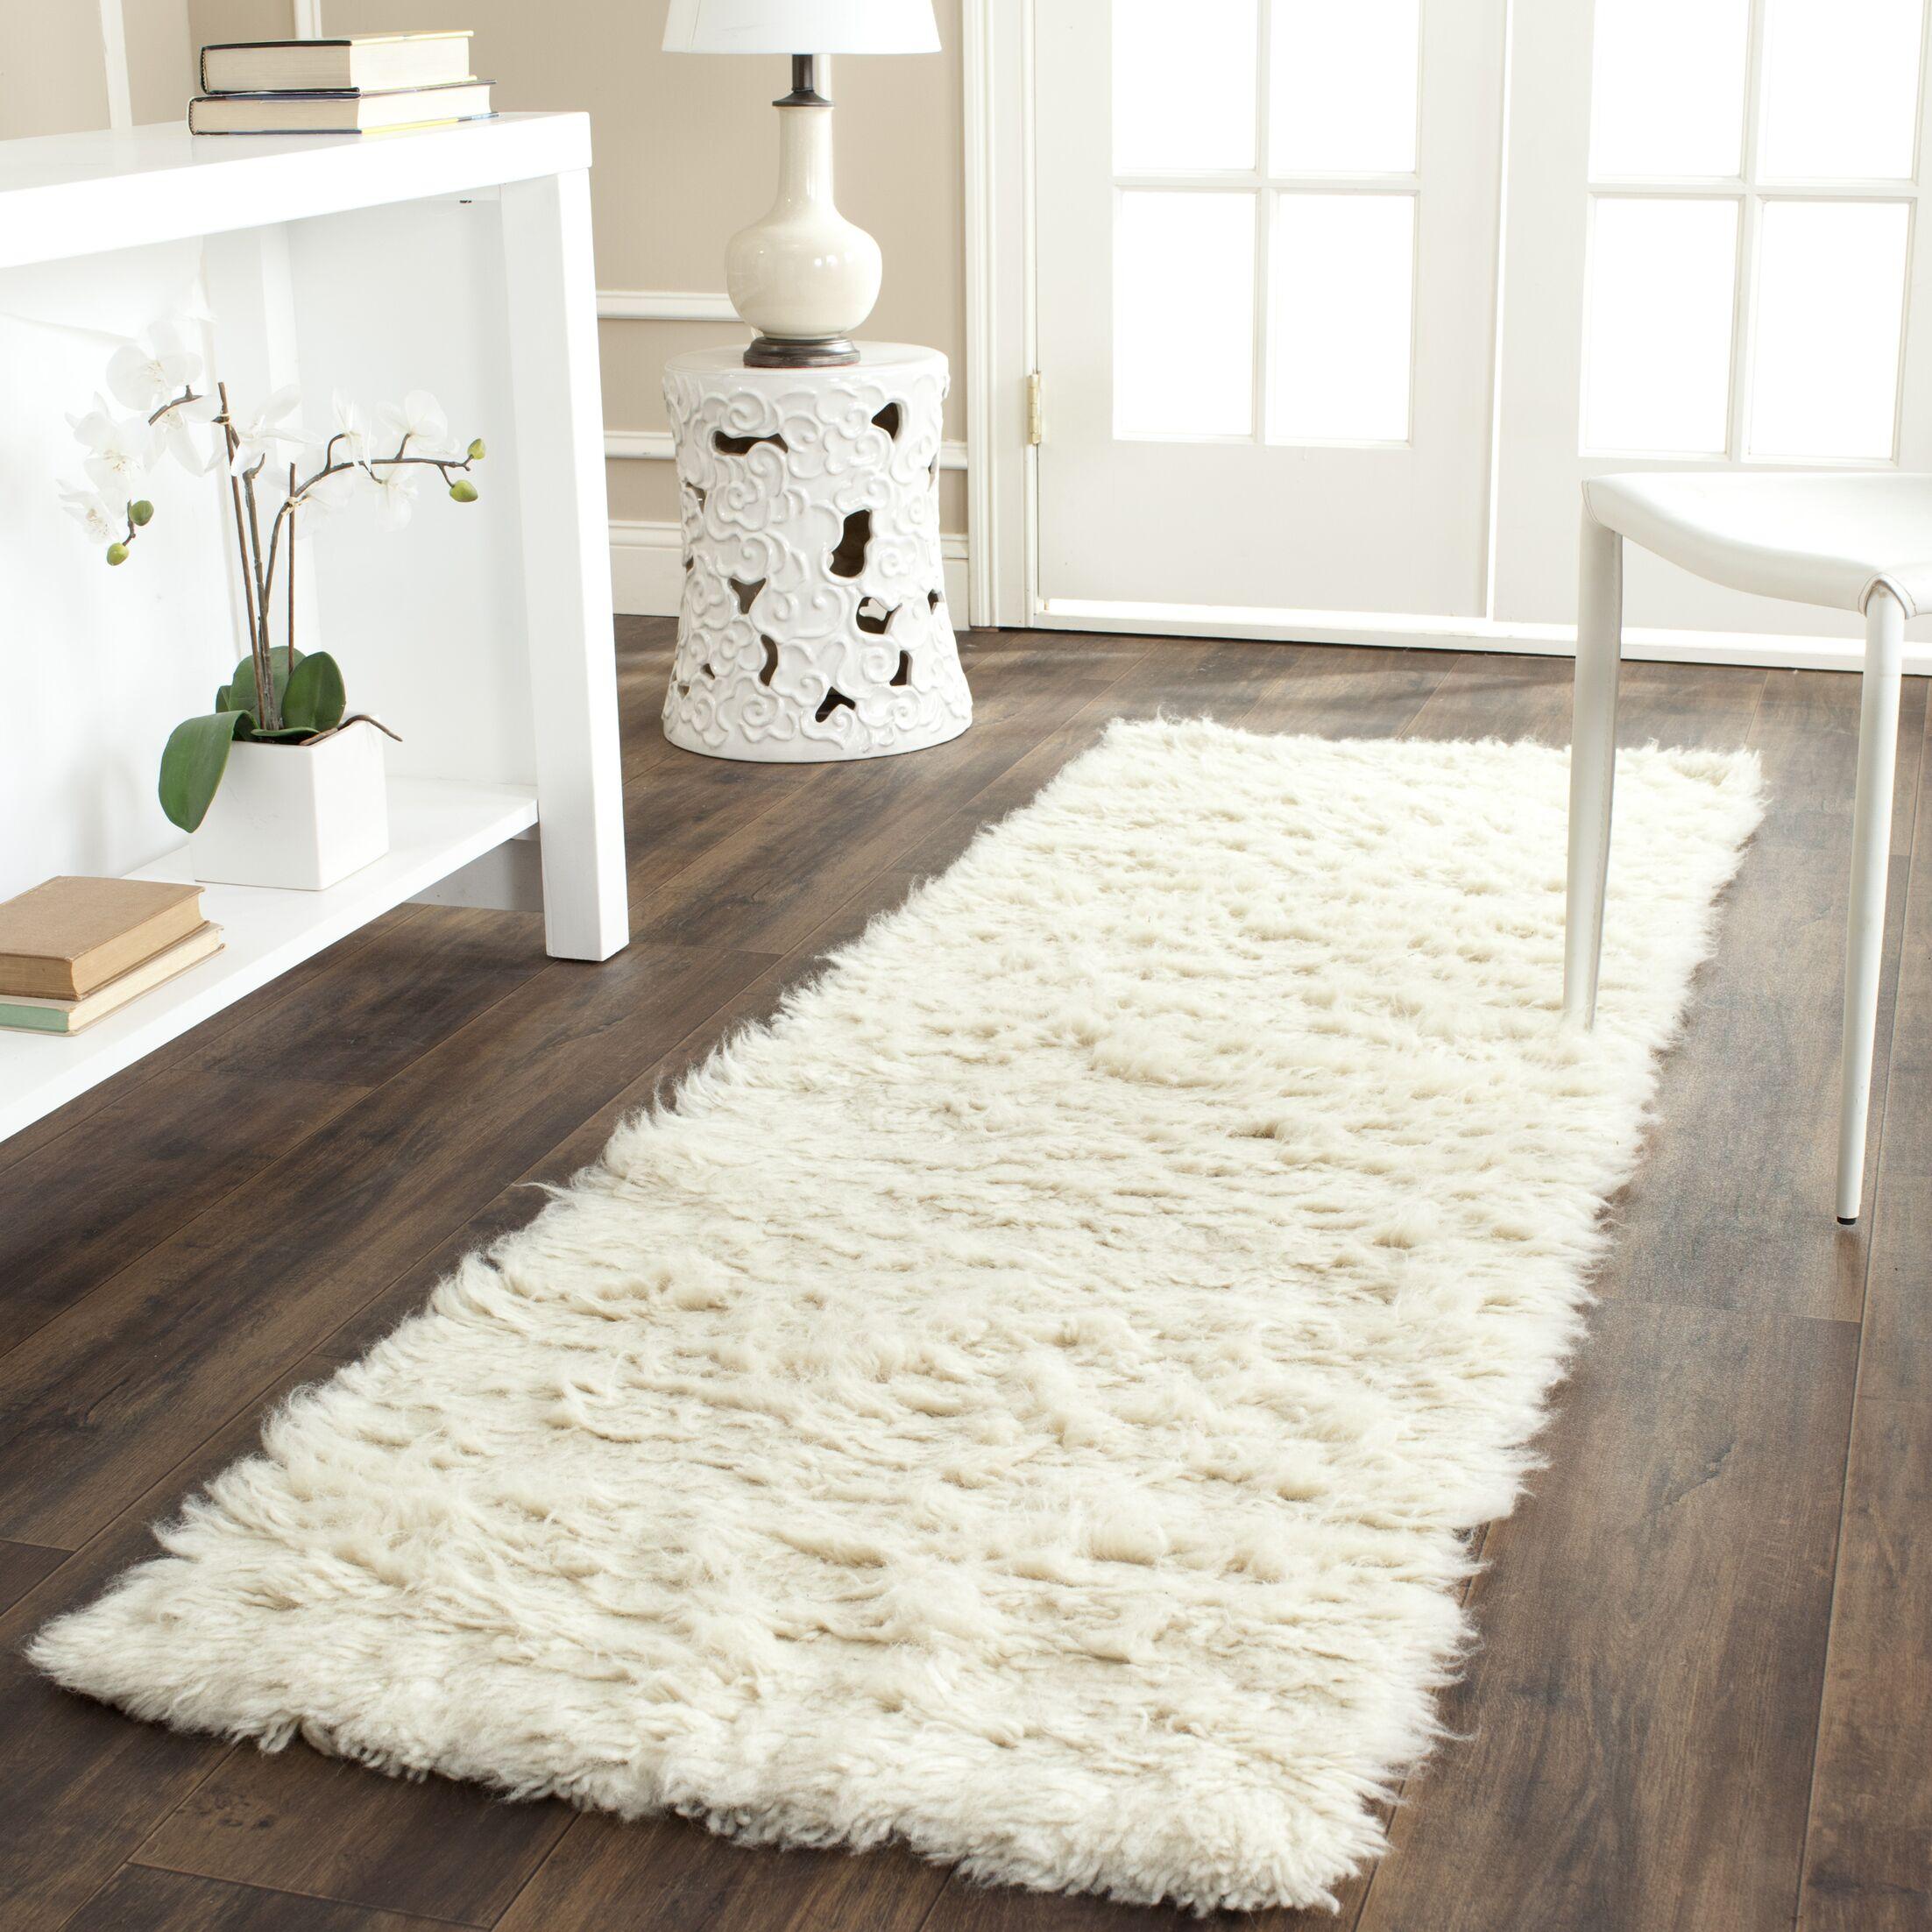 Flokati Hand-Tufted Wool Ivory Area Rug Rug Size: Runner 2'3